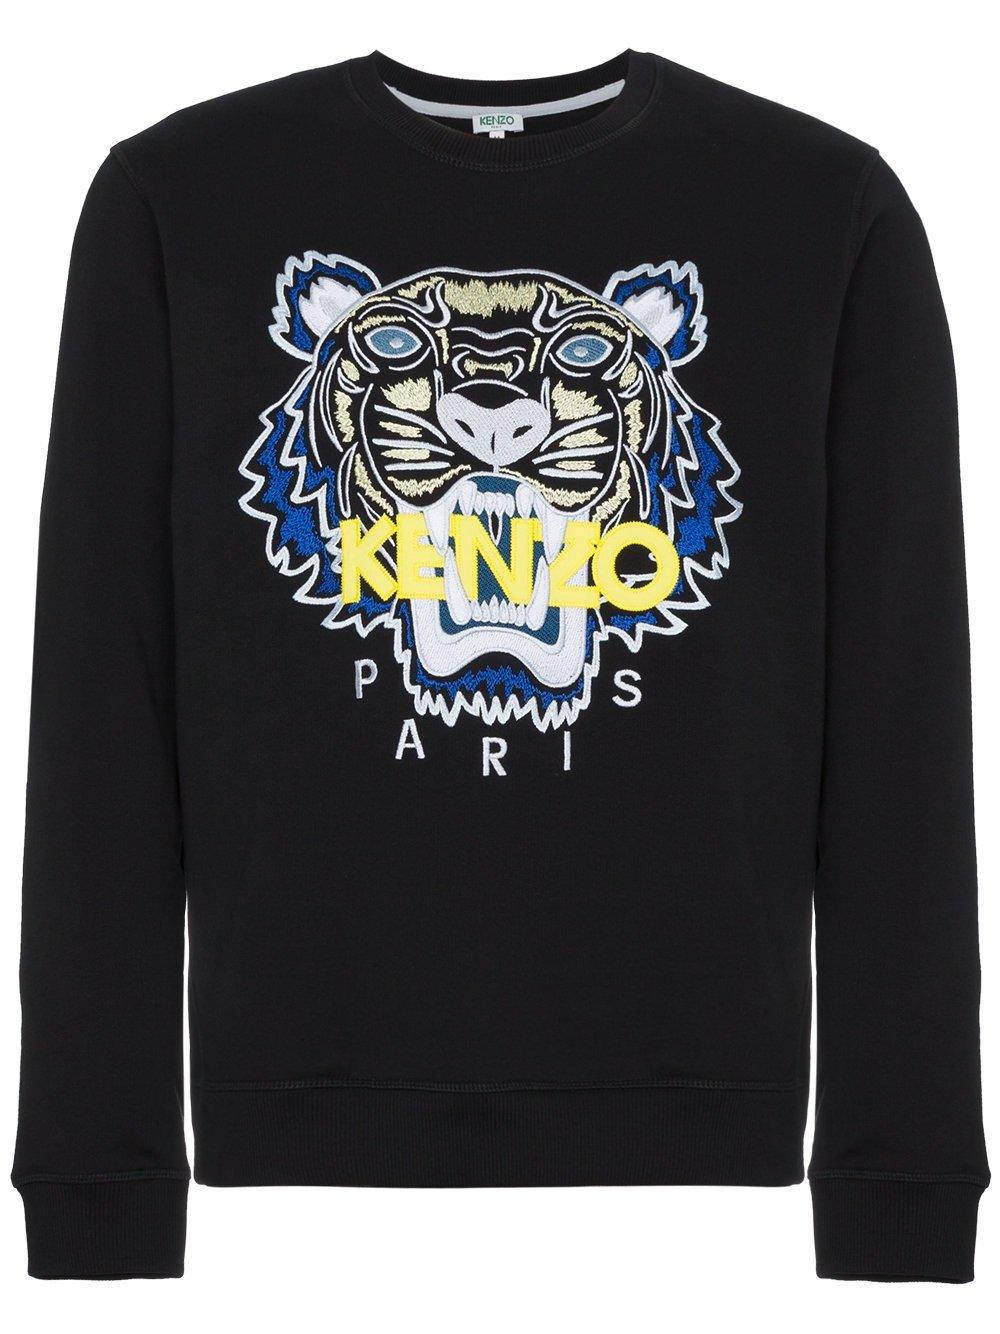 Kenzo Men's F855sw0014xa99 Black Cotton Sweatshirt